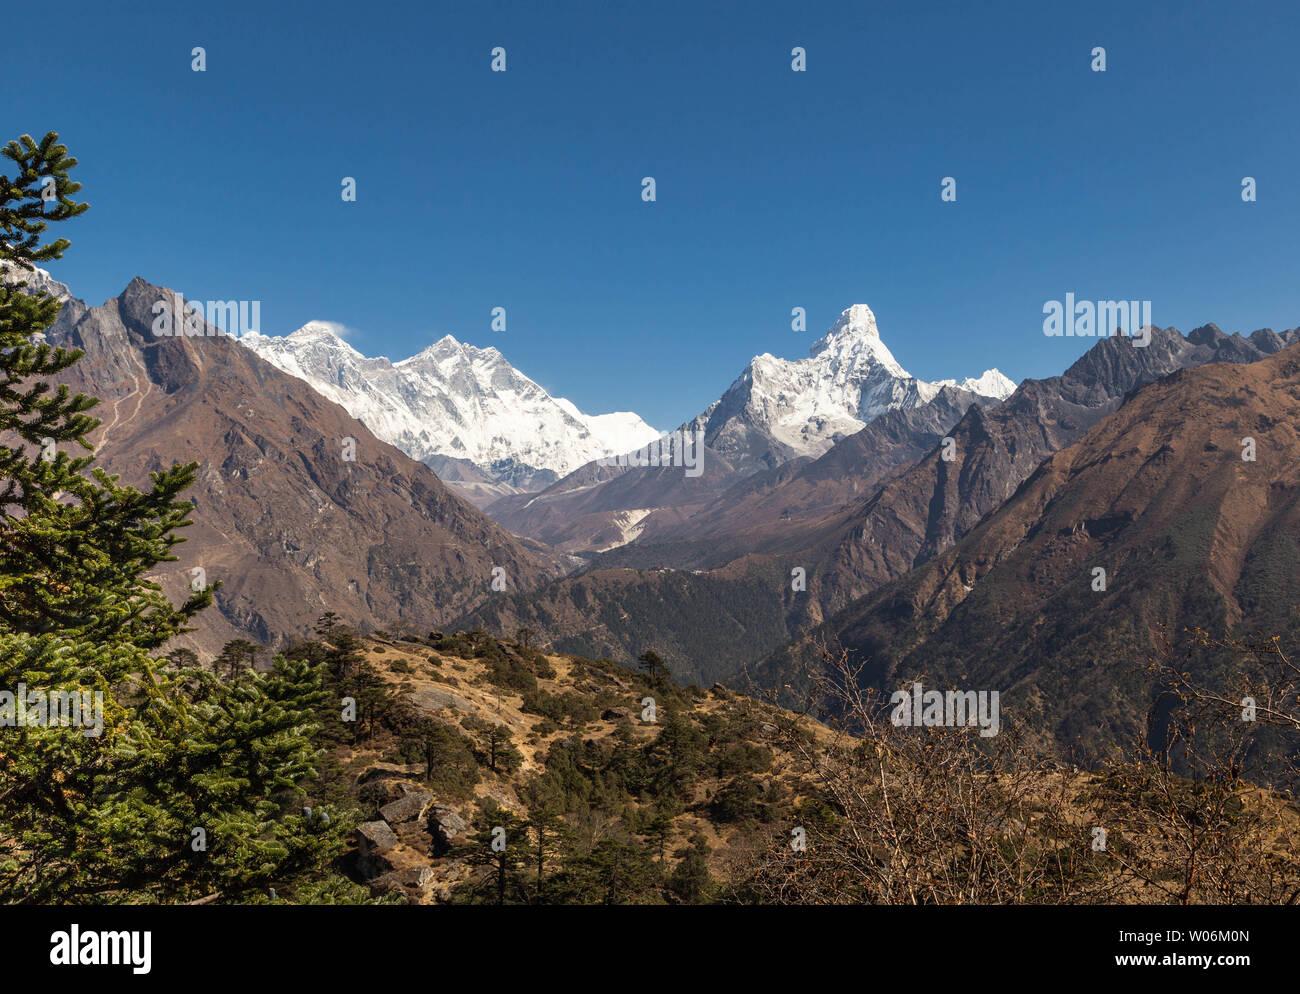 Everest Base Camp Trek, Sagarmatha National Park, Nepal - Stock Image